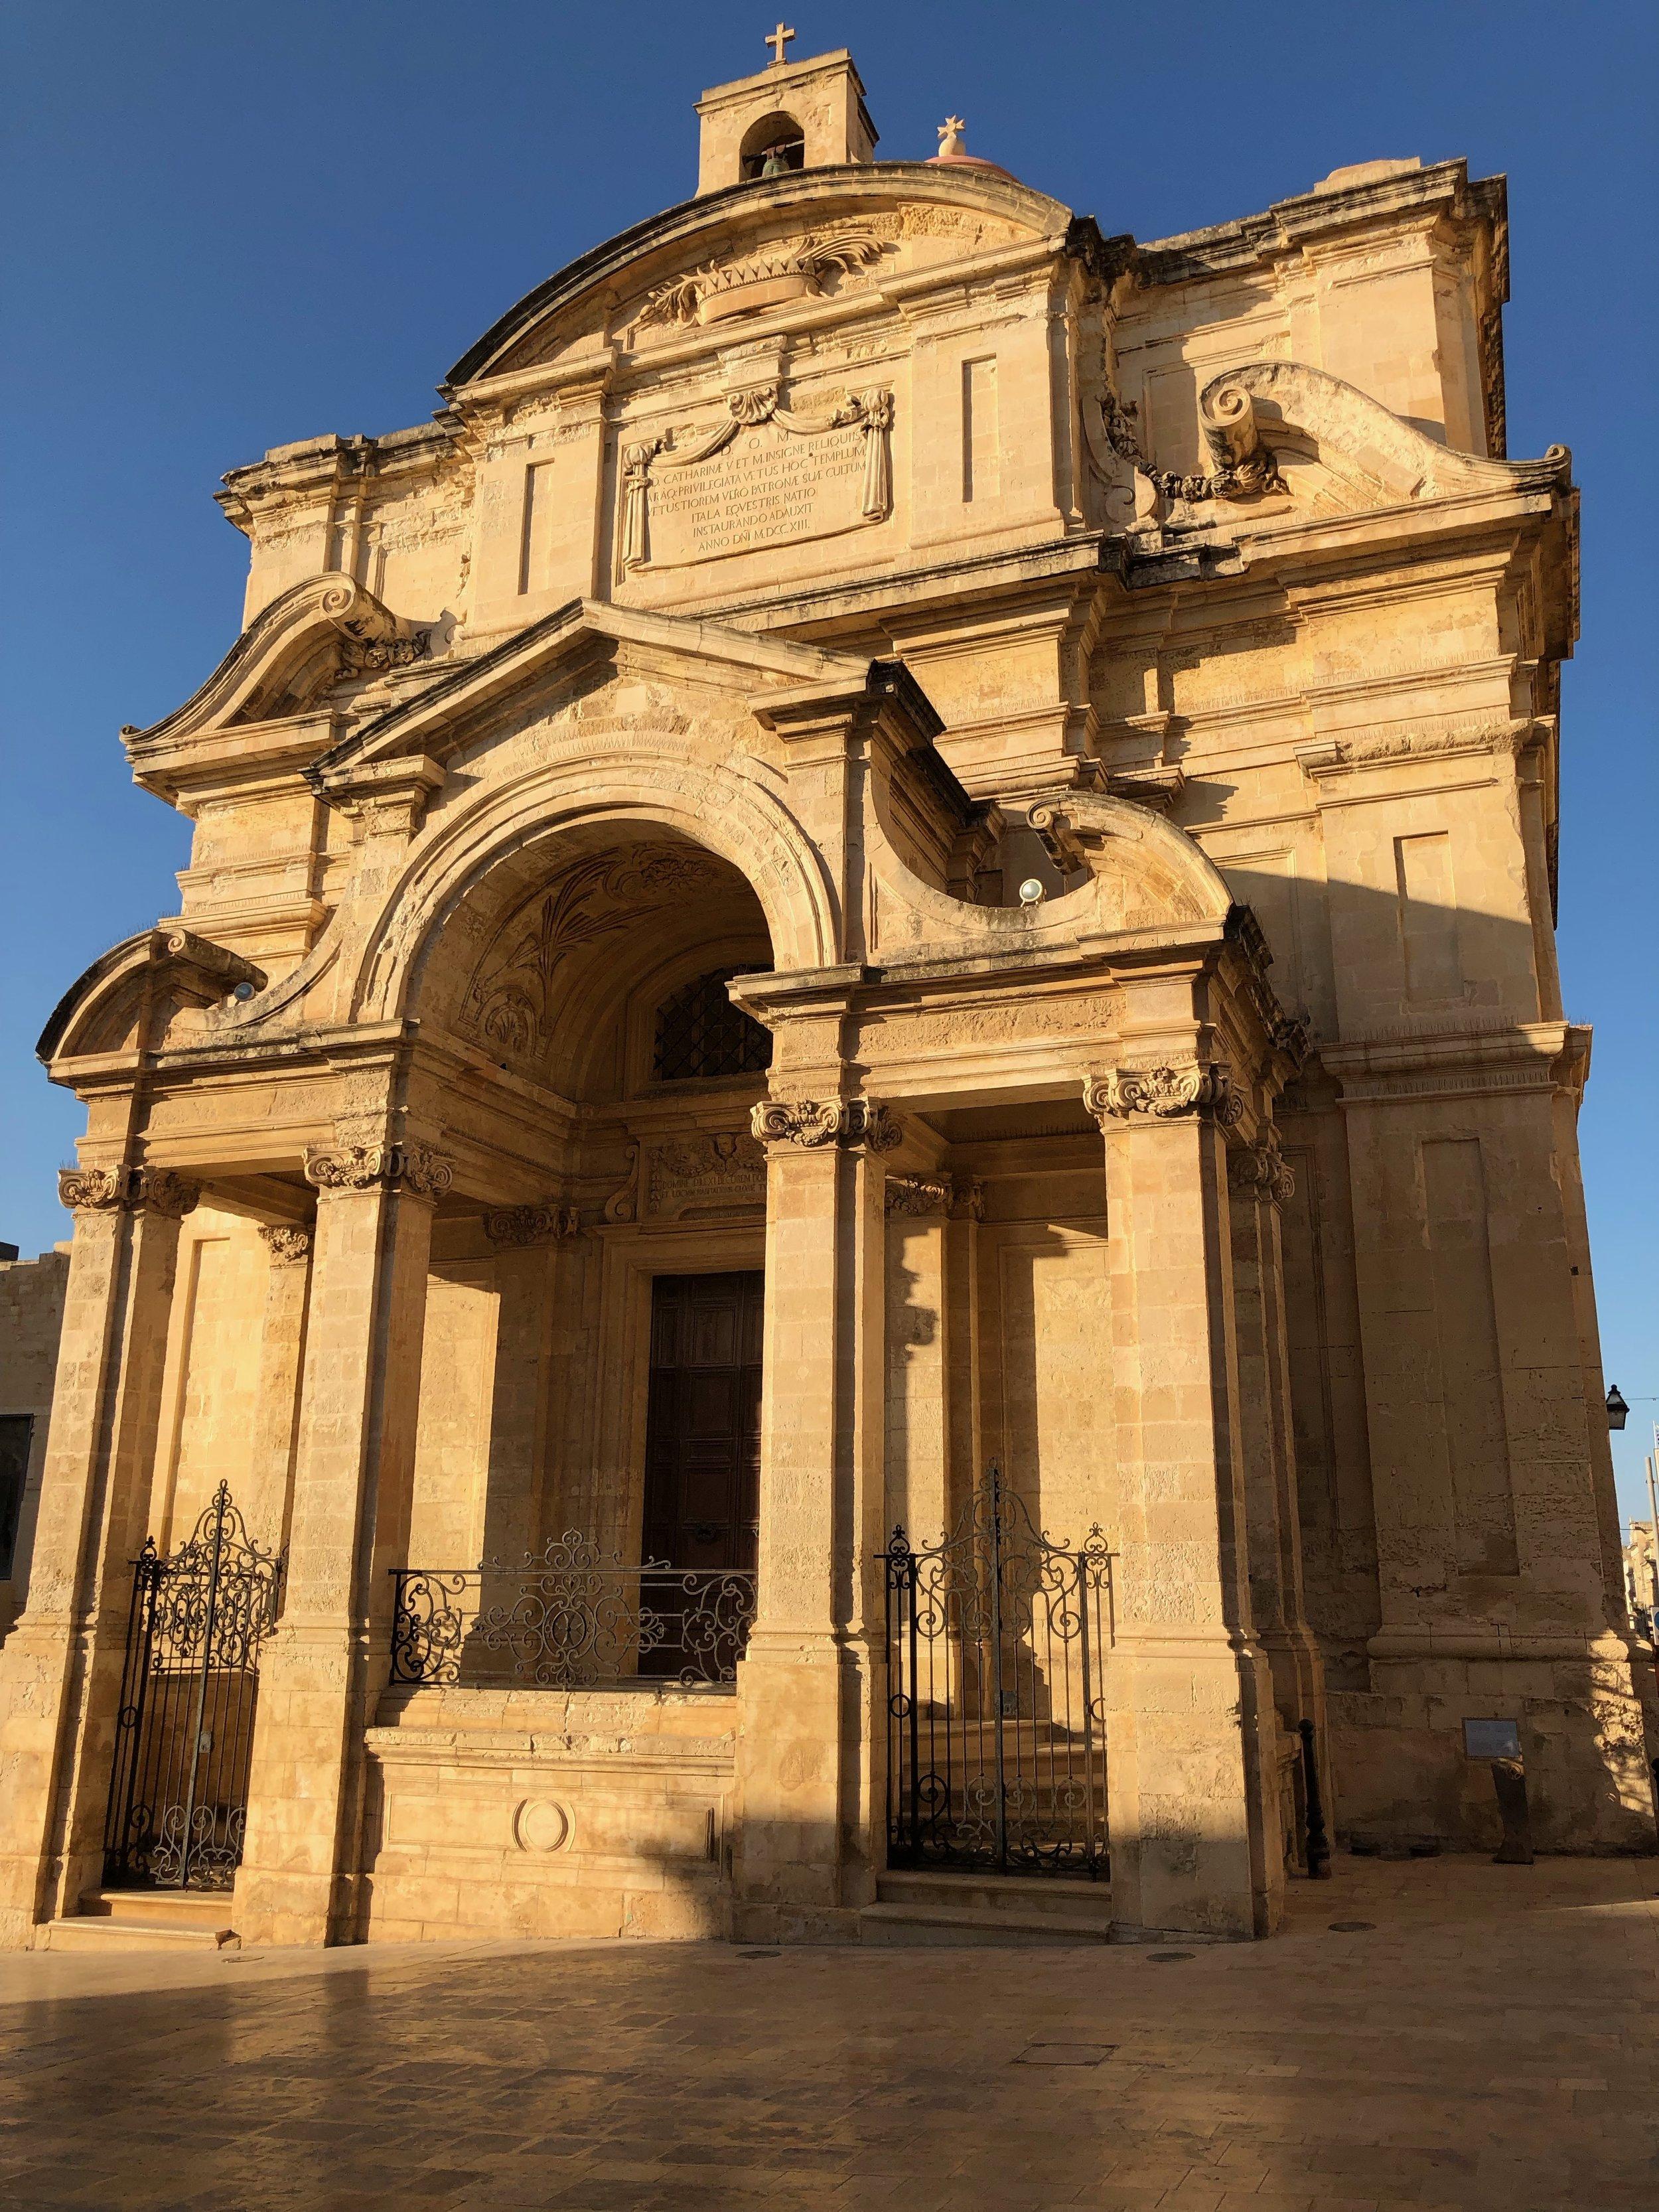 The golden hour in Valetta, Malta.